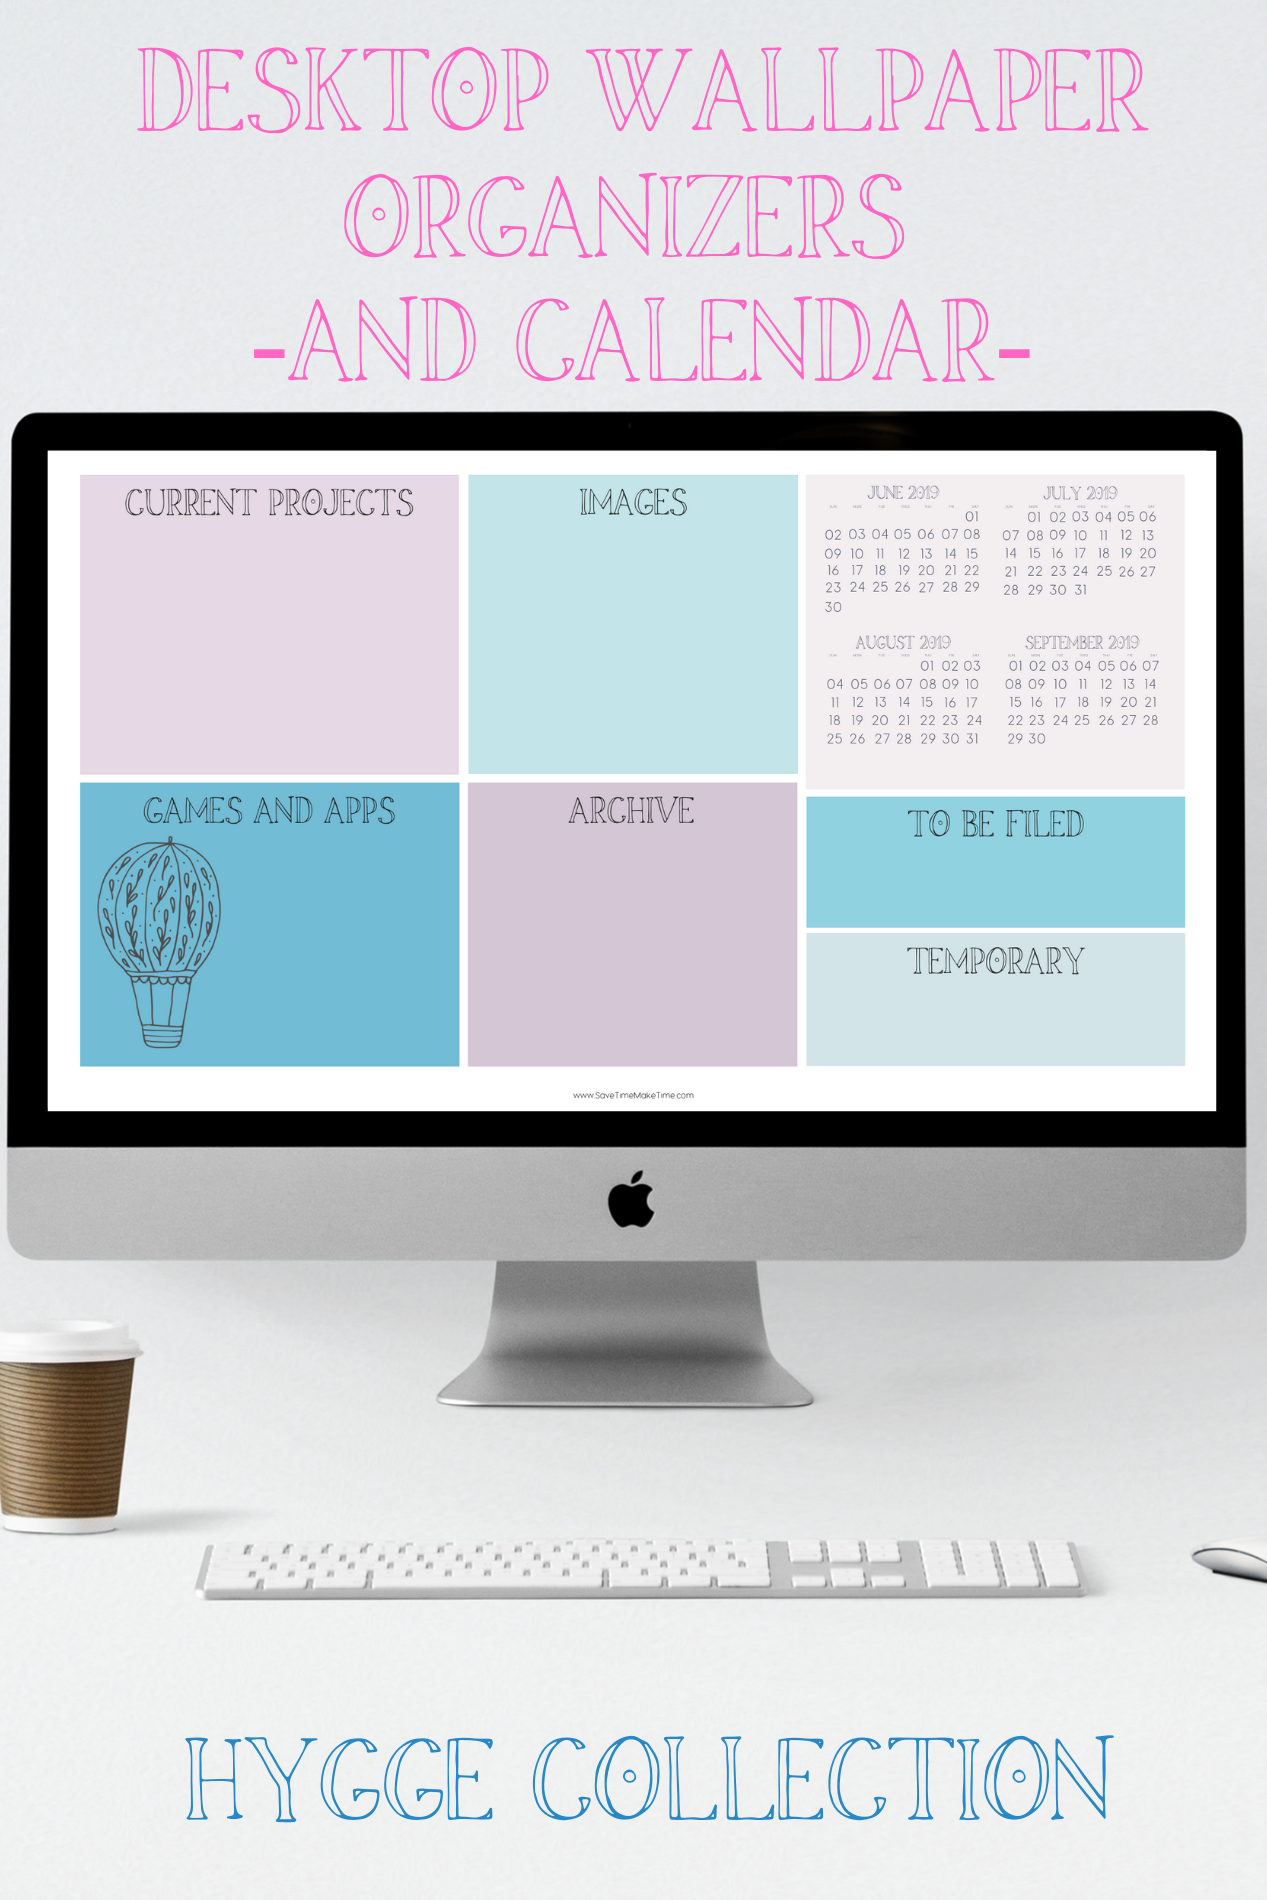 Seasonal Desktop Wallpaper Organizers And Calendars Hygge Inspired Save Time Make Time Sh Desktop Wallpaper Organizer Desktop Organization Work Organization